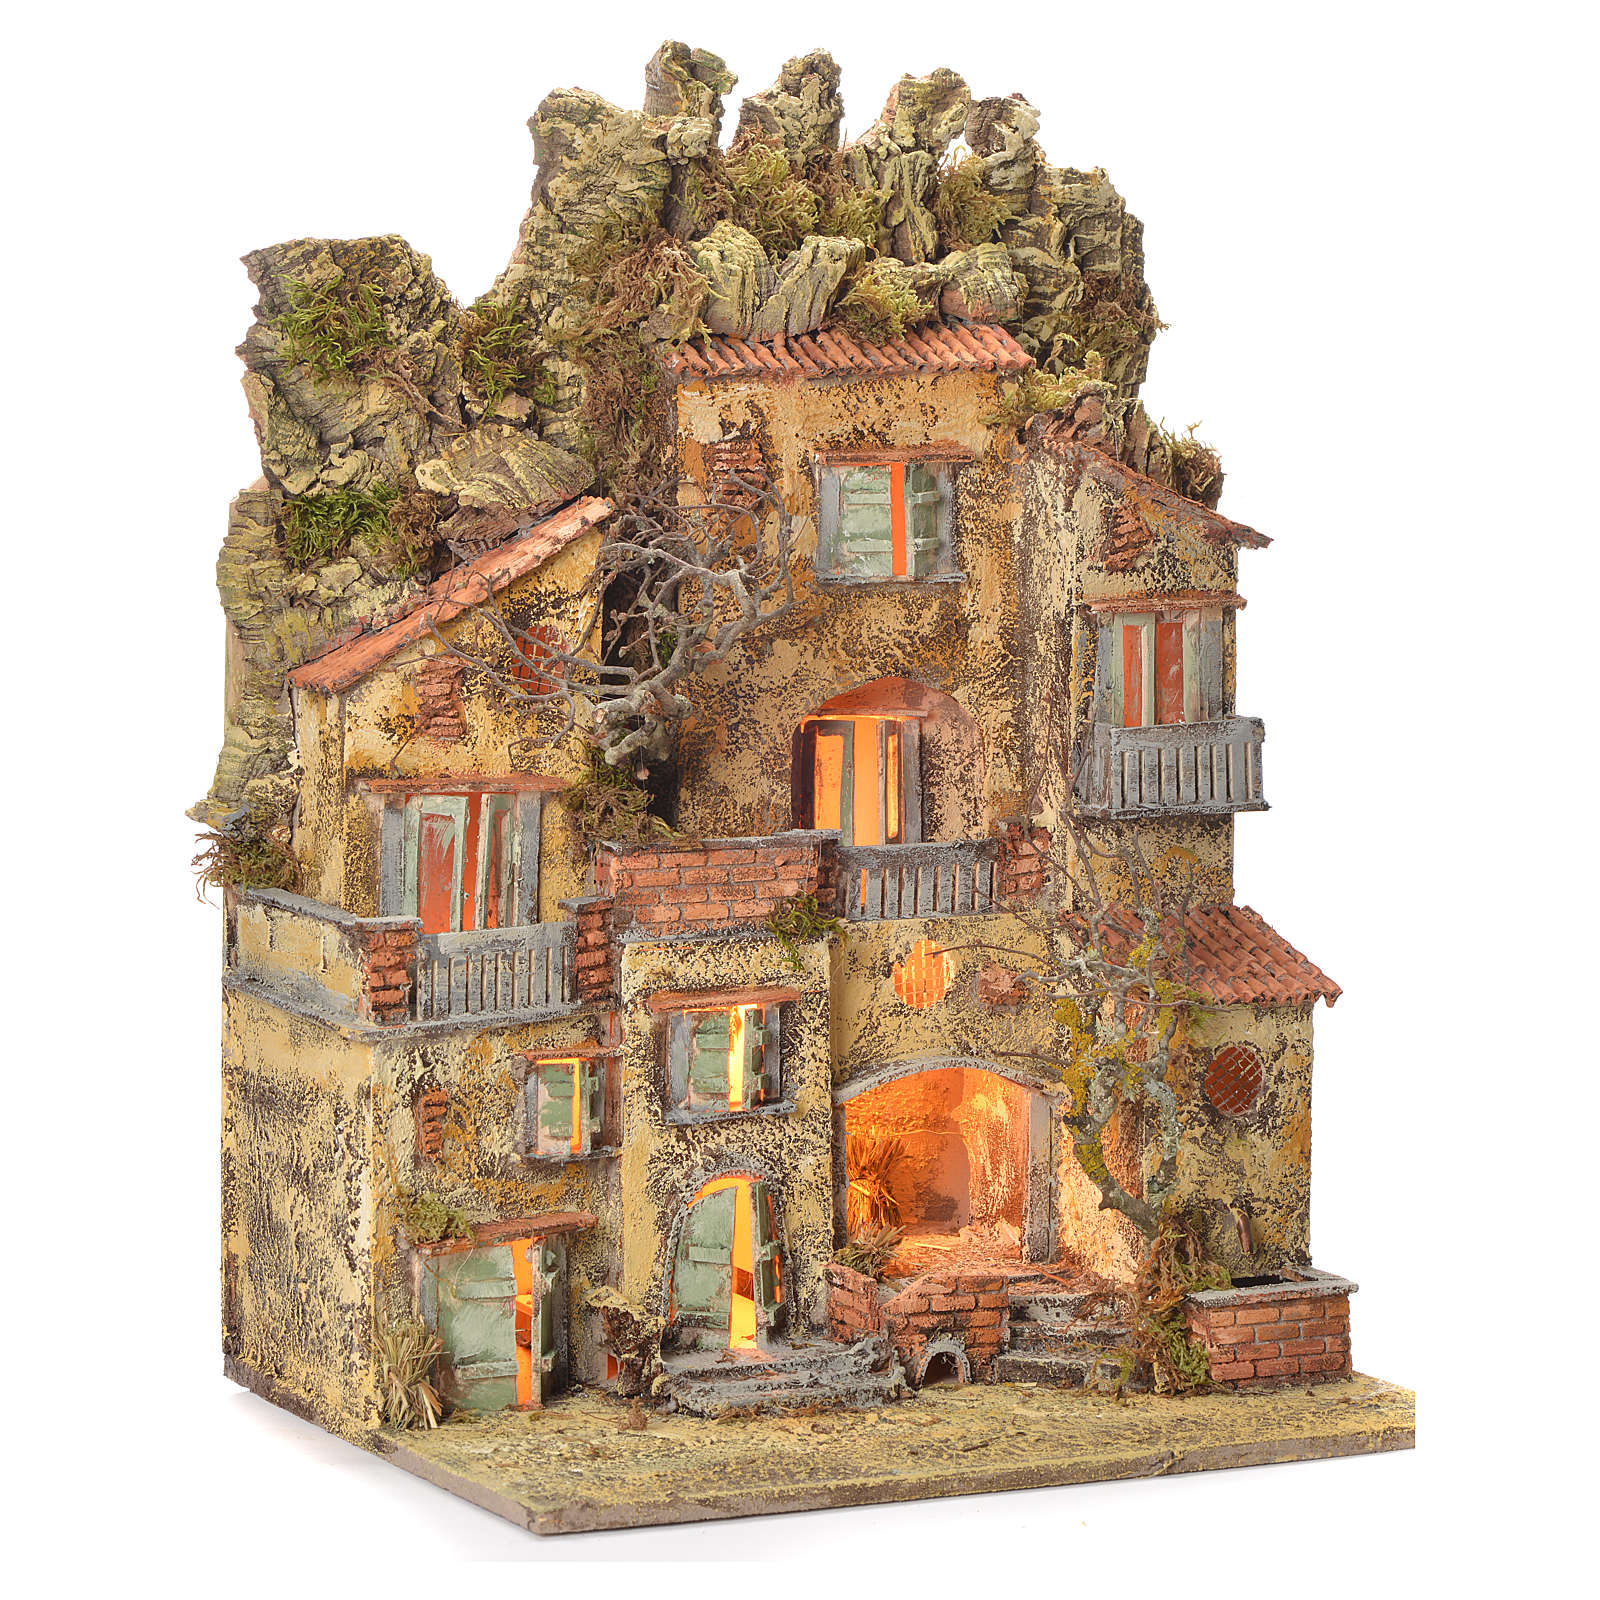 Borgo presepe napoletano con fontana 65X45X35 cm 4